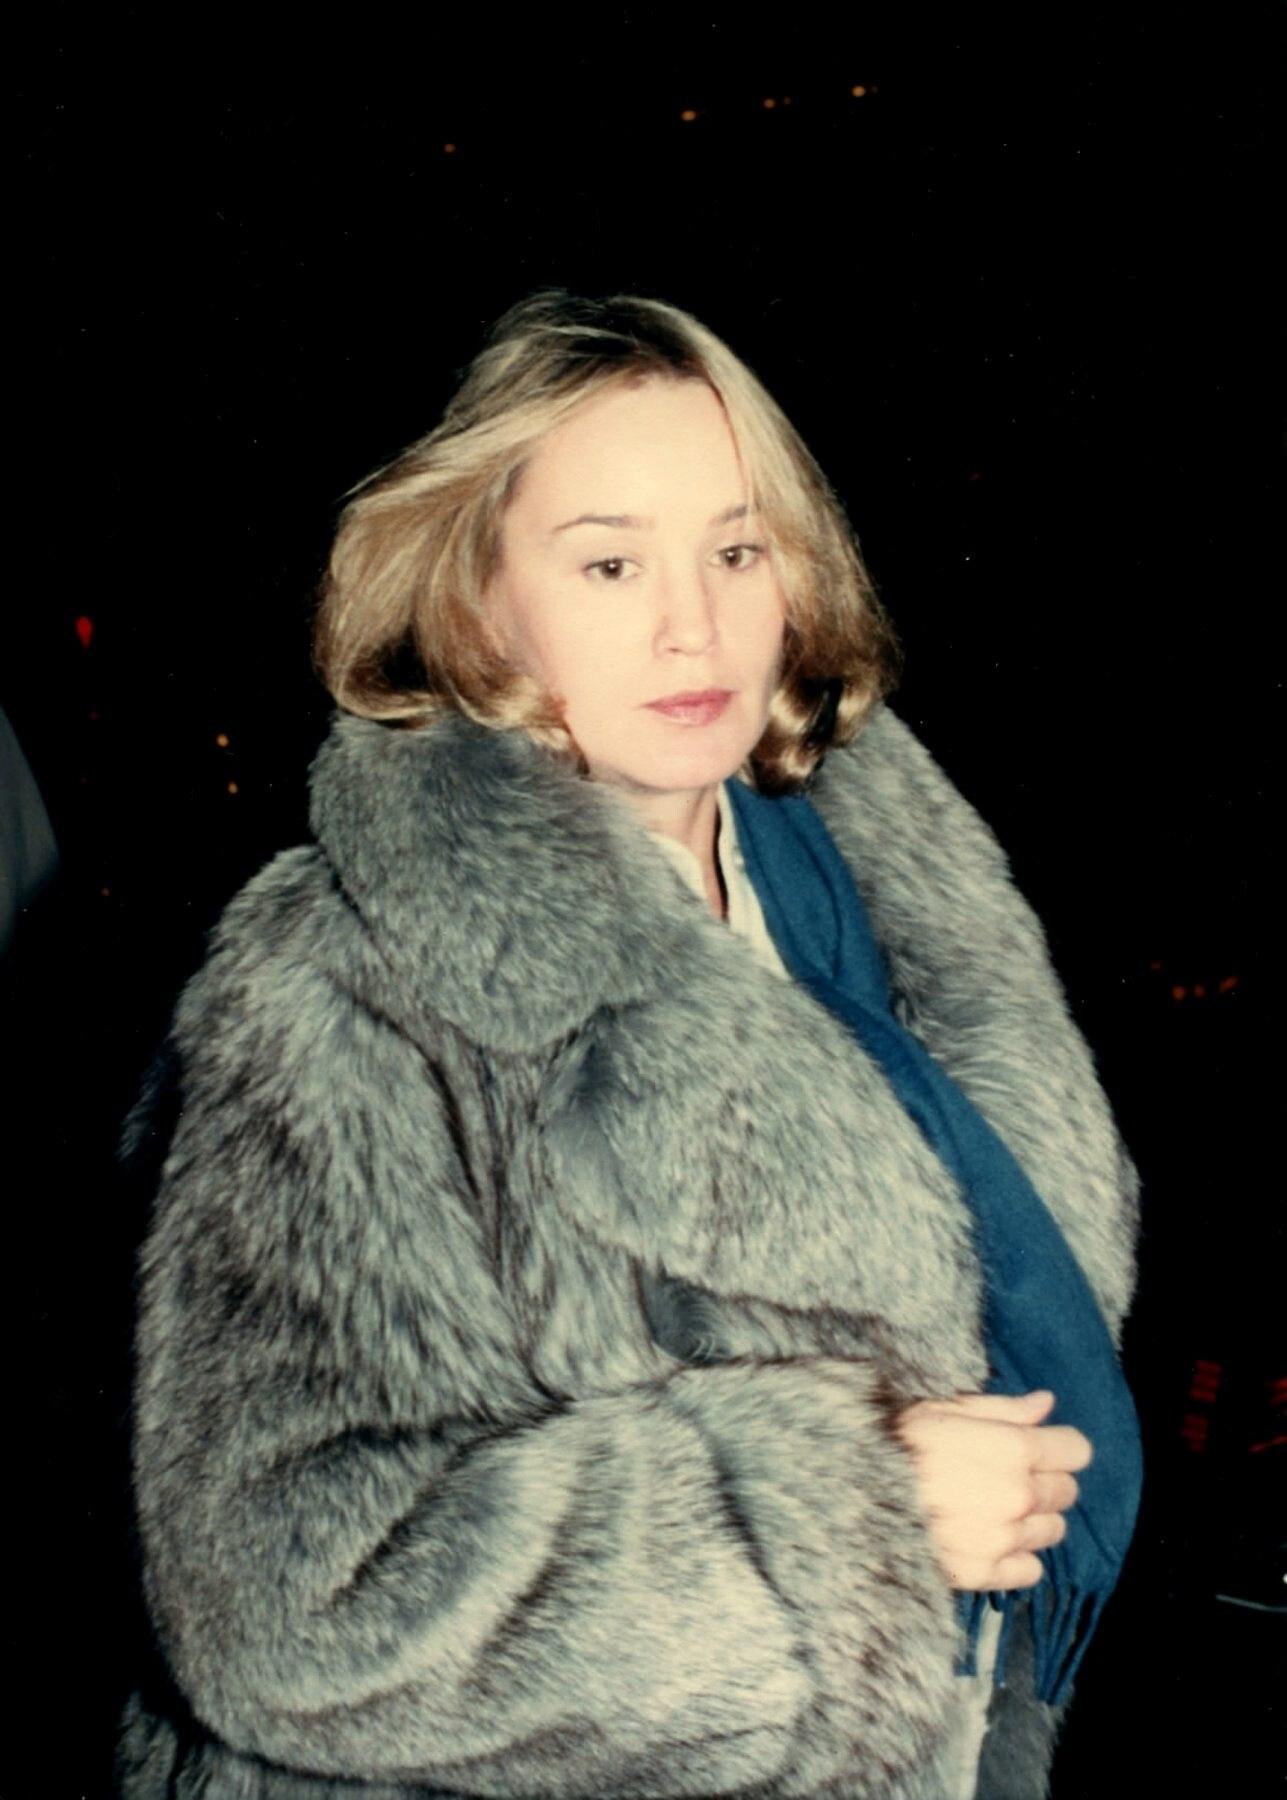 Wearing a fur coat